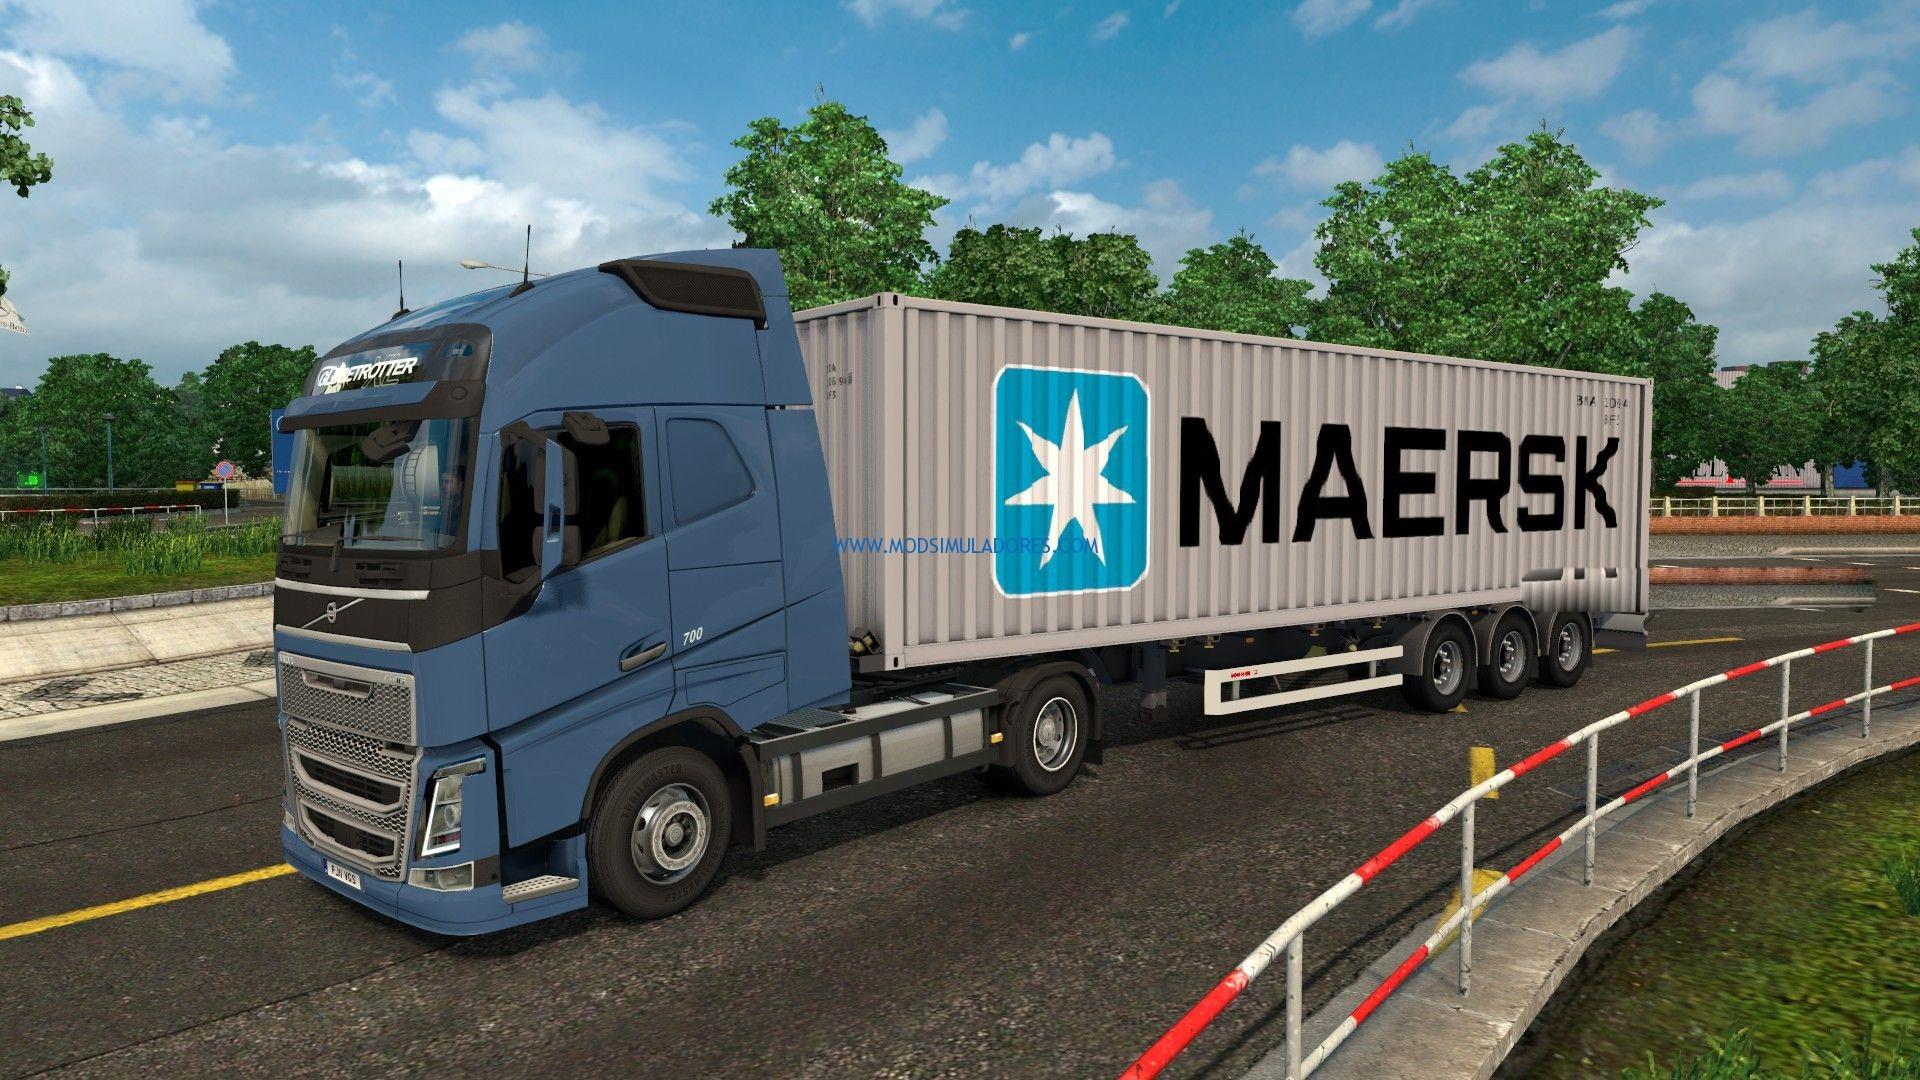 Baixar containers matson e maersk para mod simuladores - Matson container homes ...